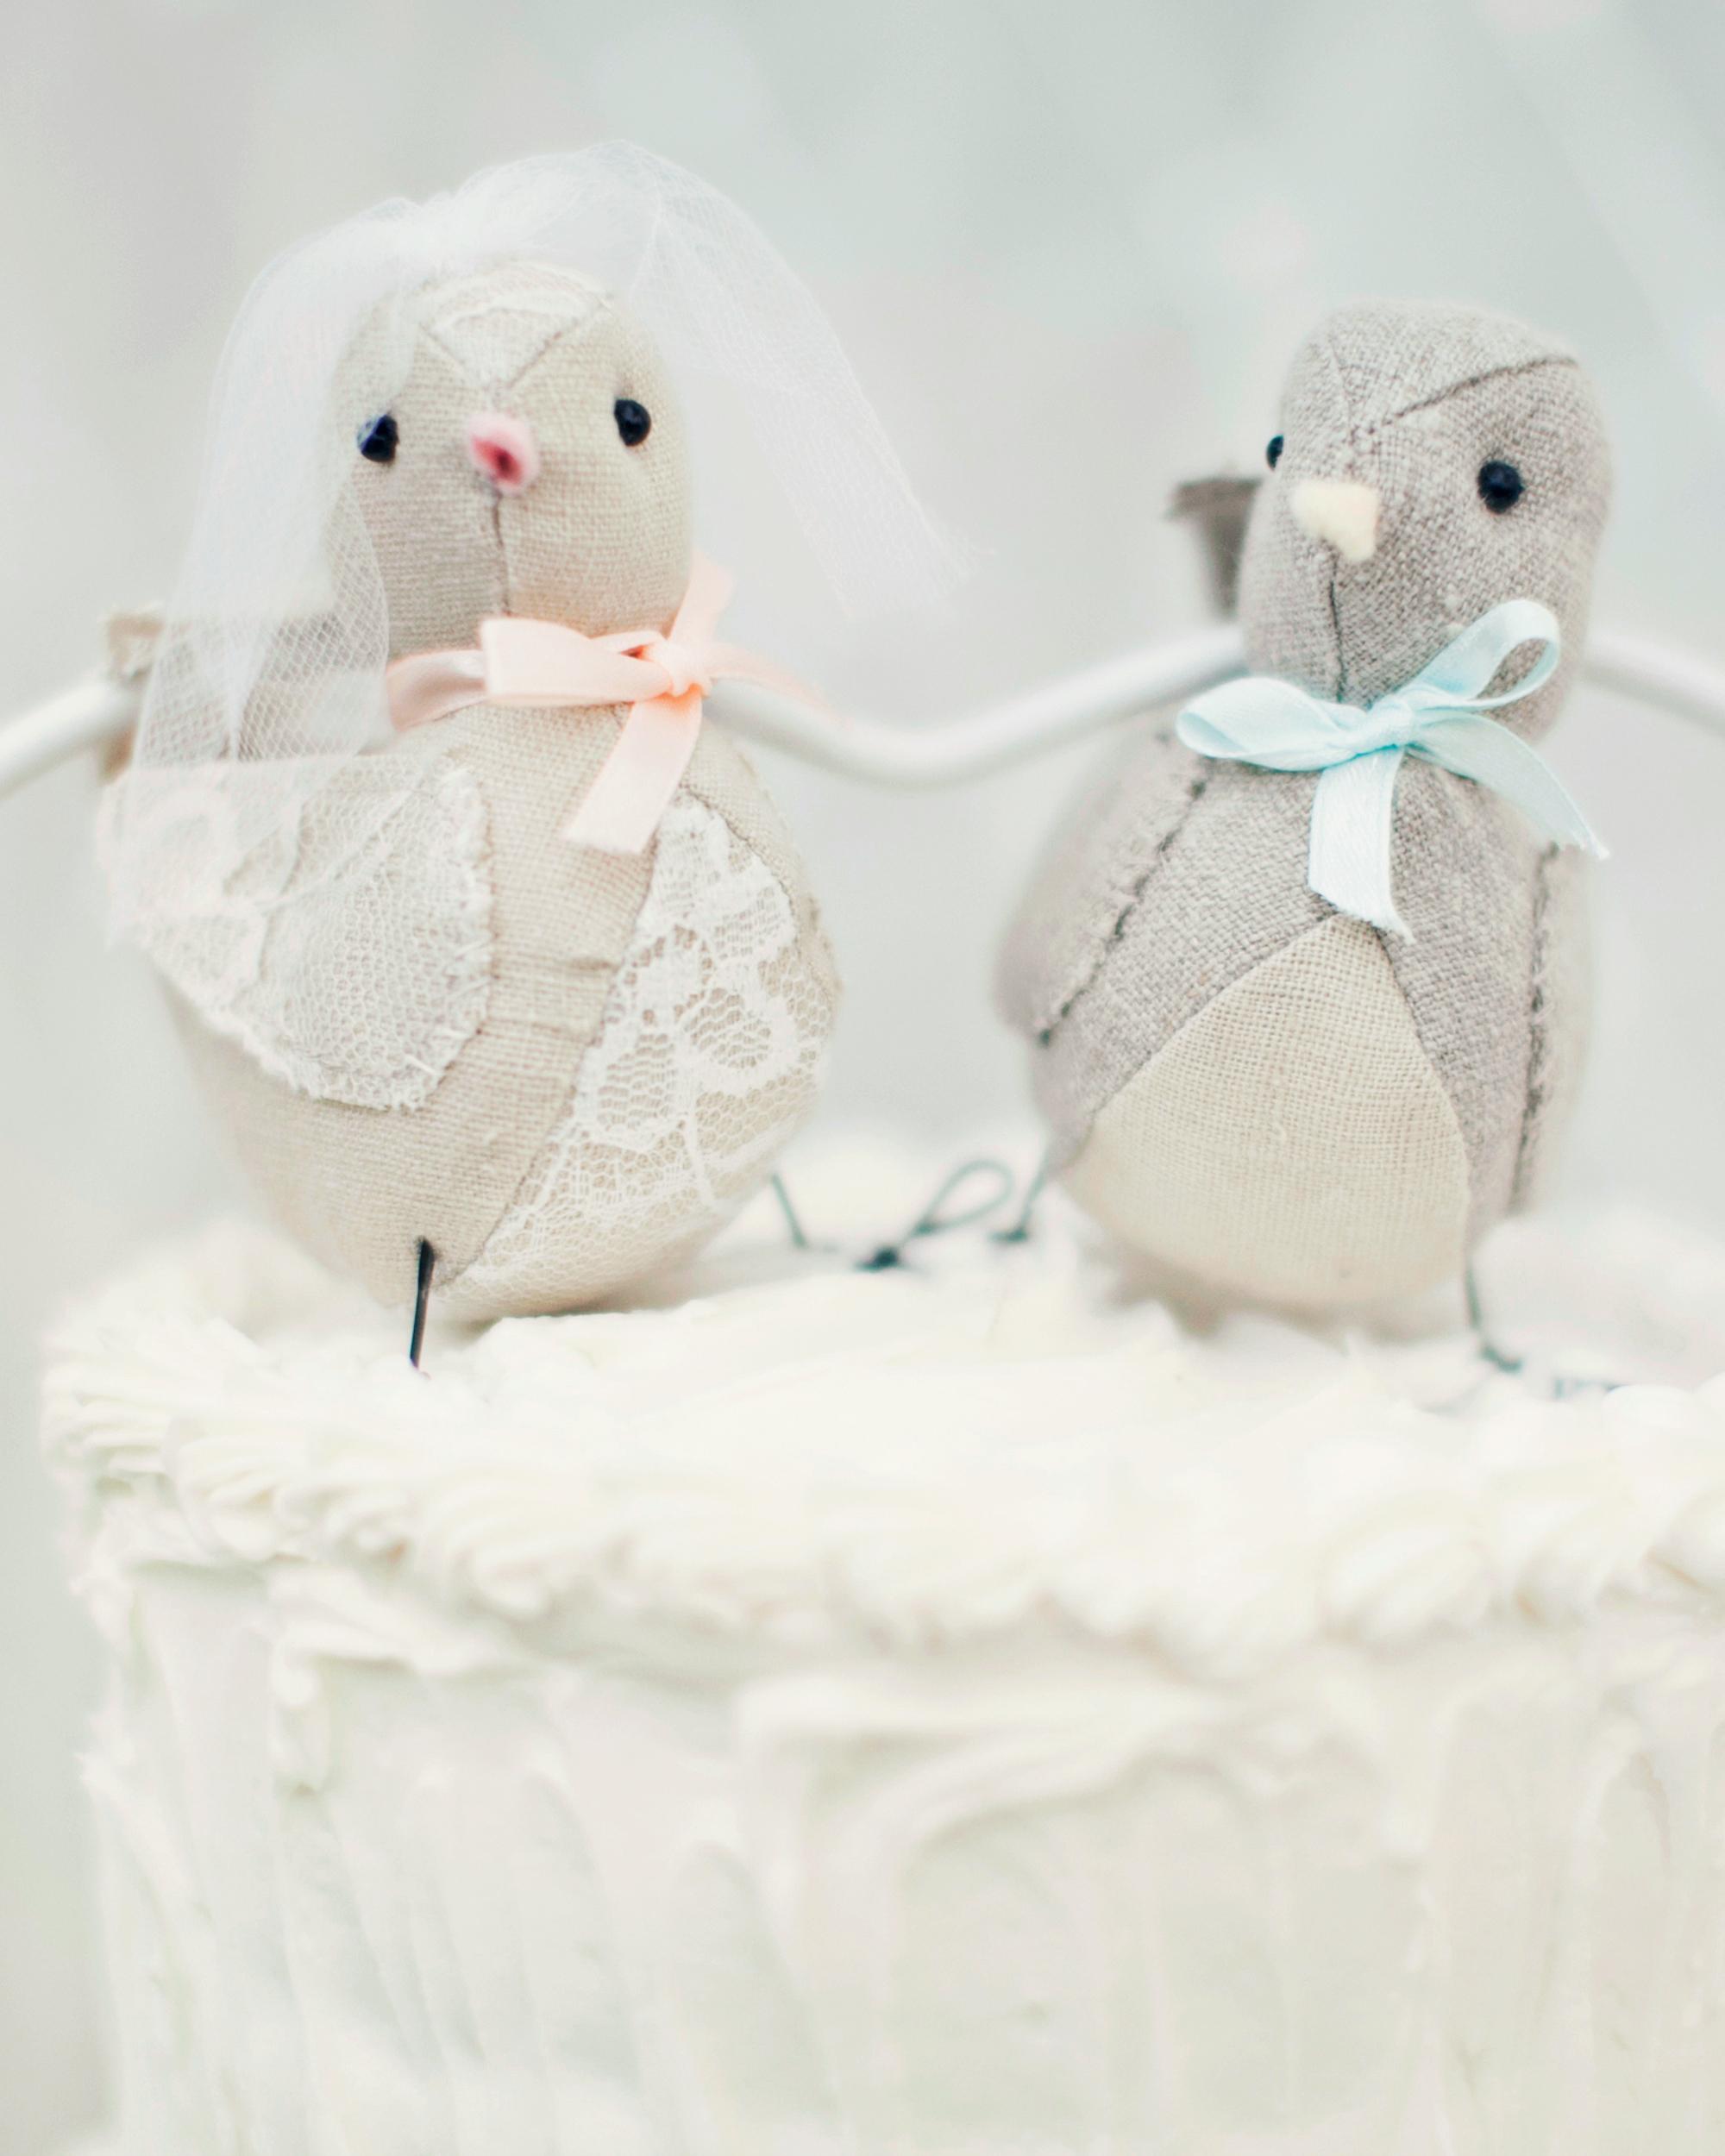 real-weddings-abby-julian-0711-496.jpg